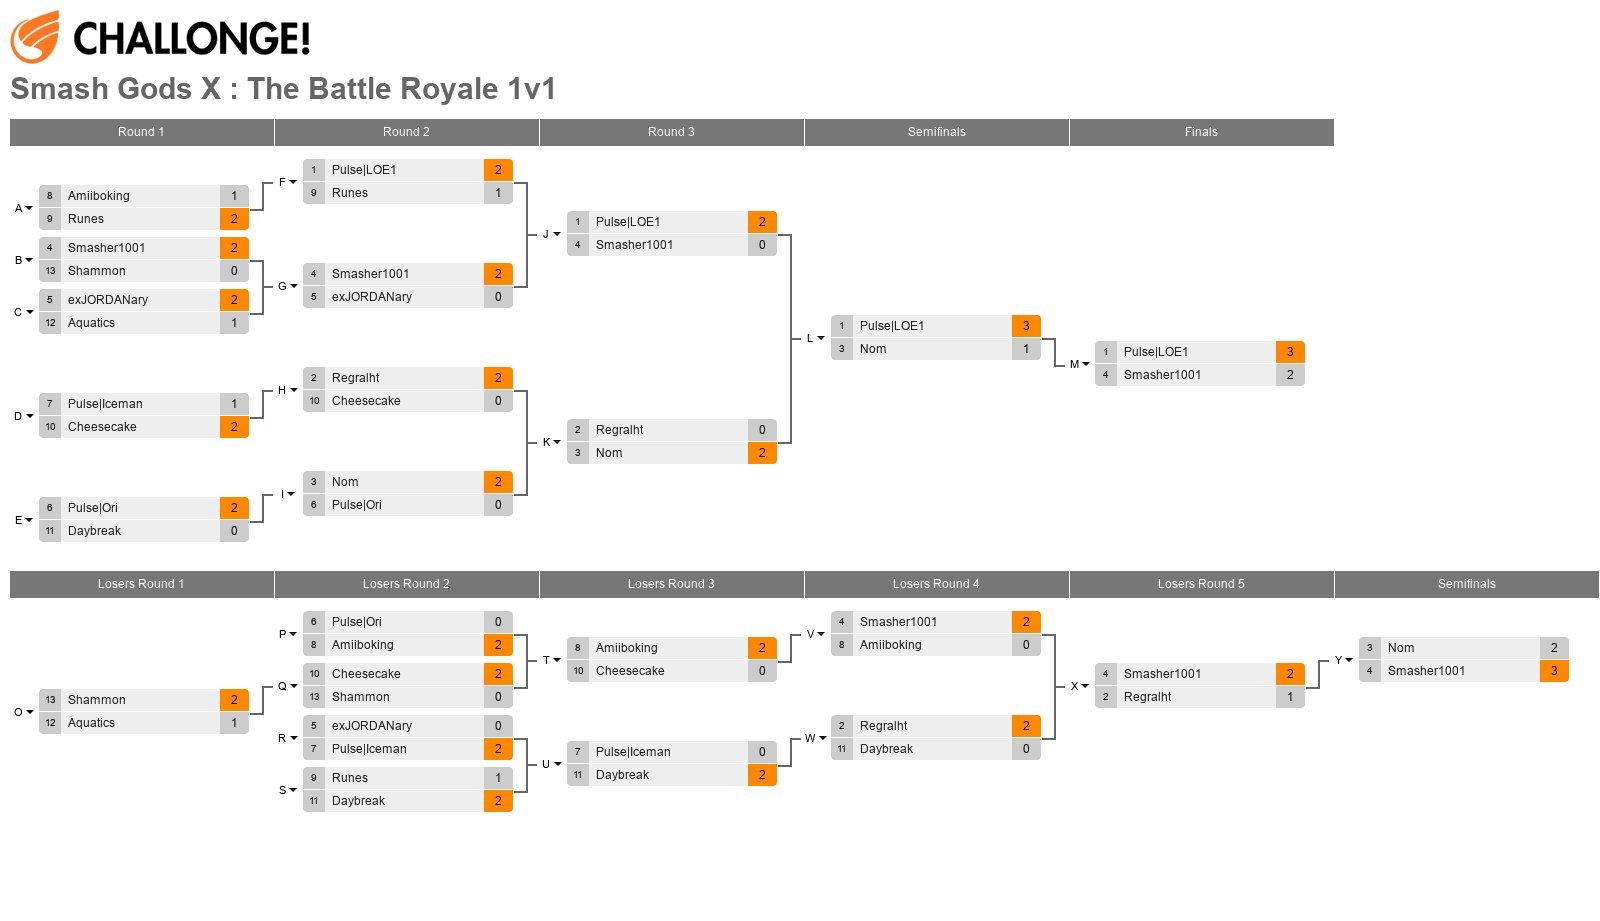 Smash Gods X : The Battle Royale 1v1